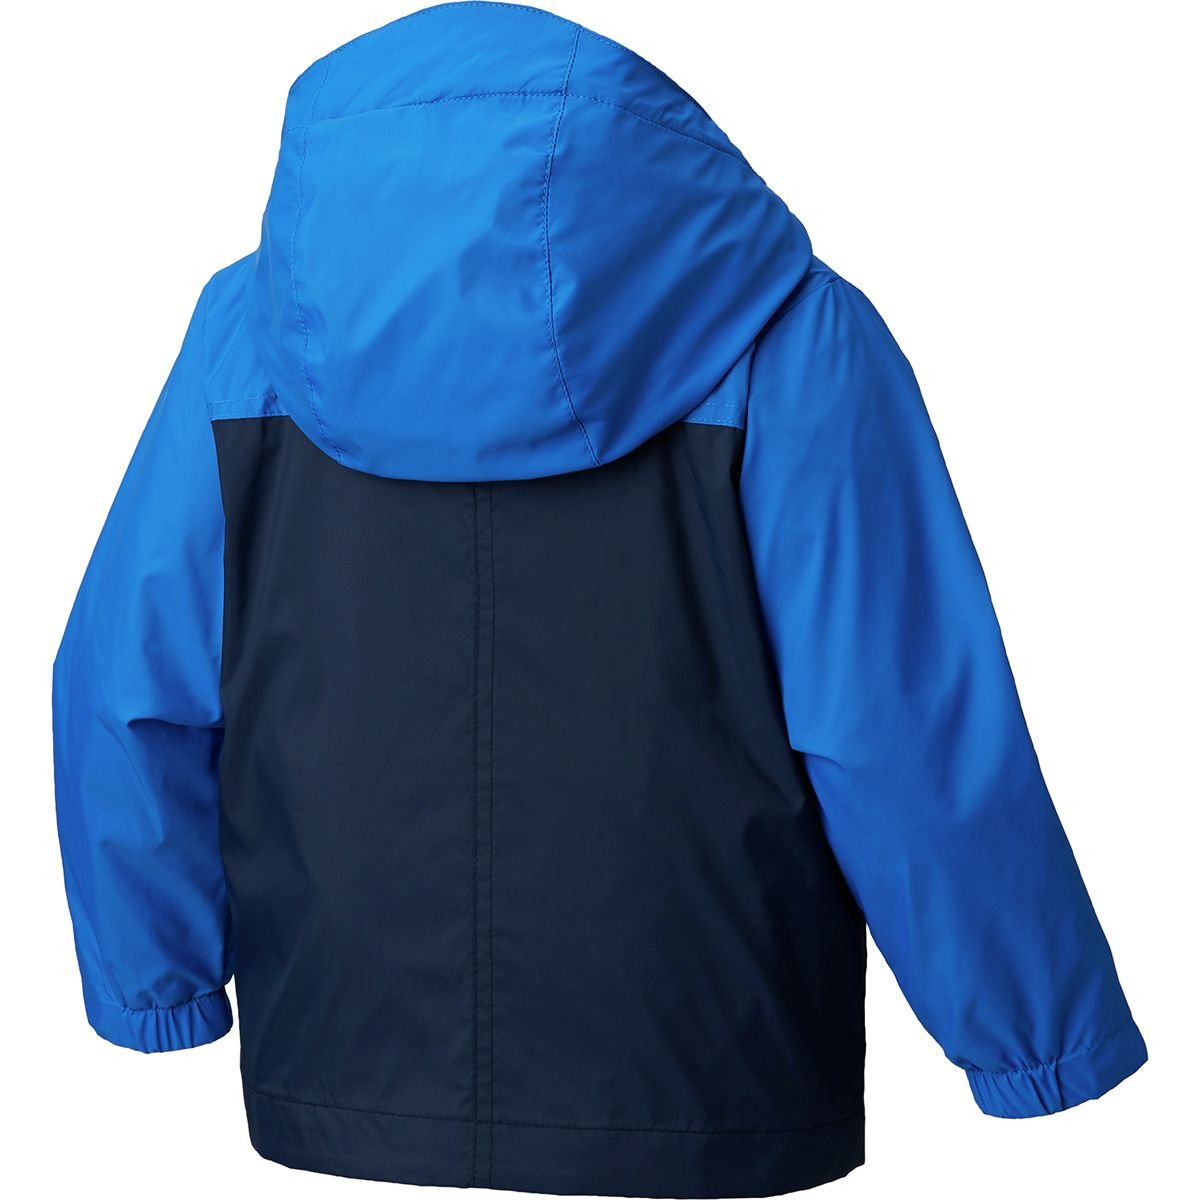 Little Kids//Big Kids Columbia Kids Boys Rain-Zilla/¿ Jacket Collegiate Navy//Super Blue//Zour Small